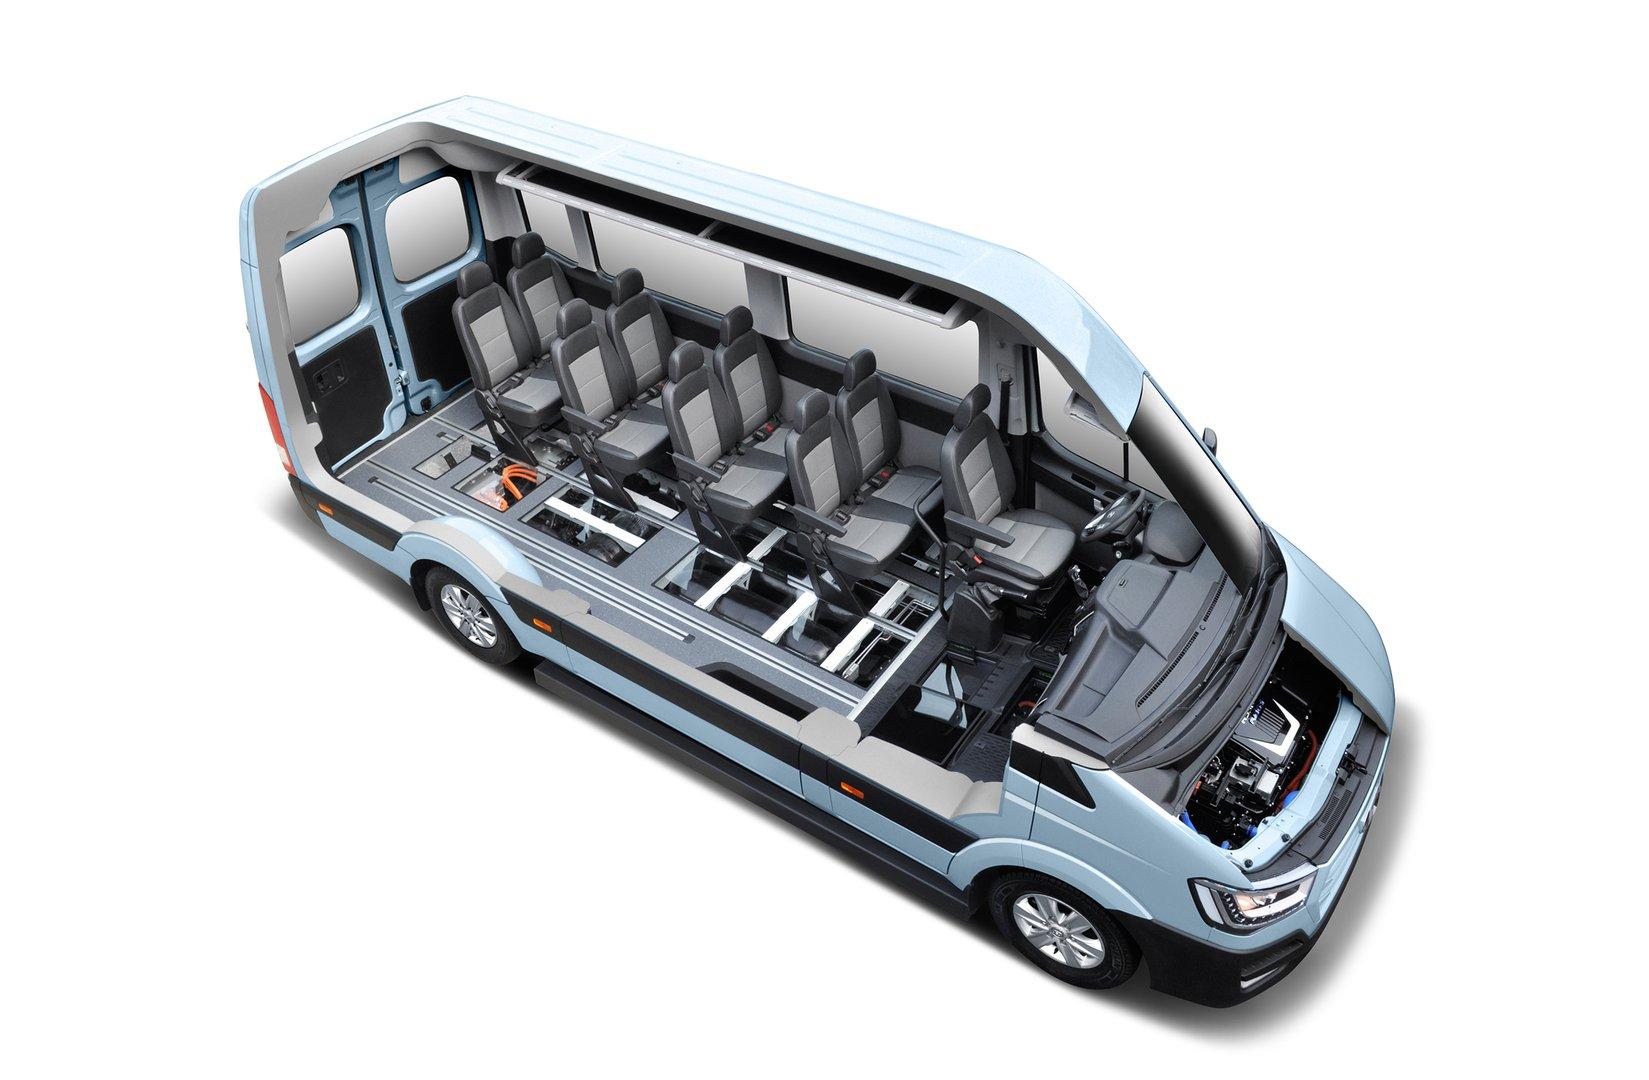 Hyundai 39 s hydrogen fuel cell minibus concept driving - Commercial van interiors locations ...